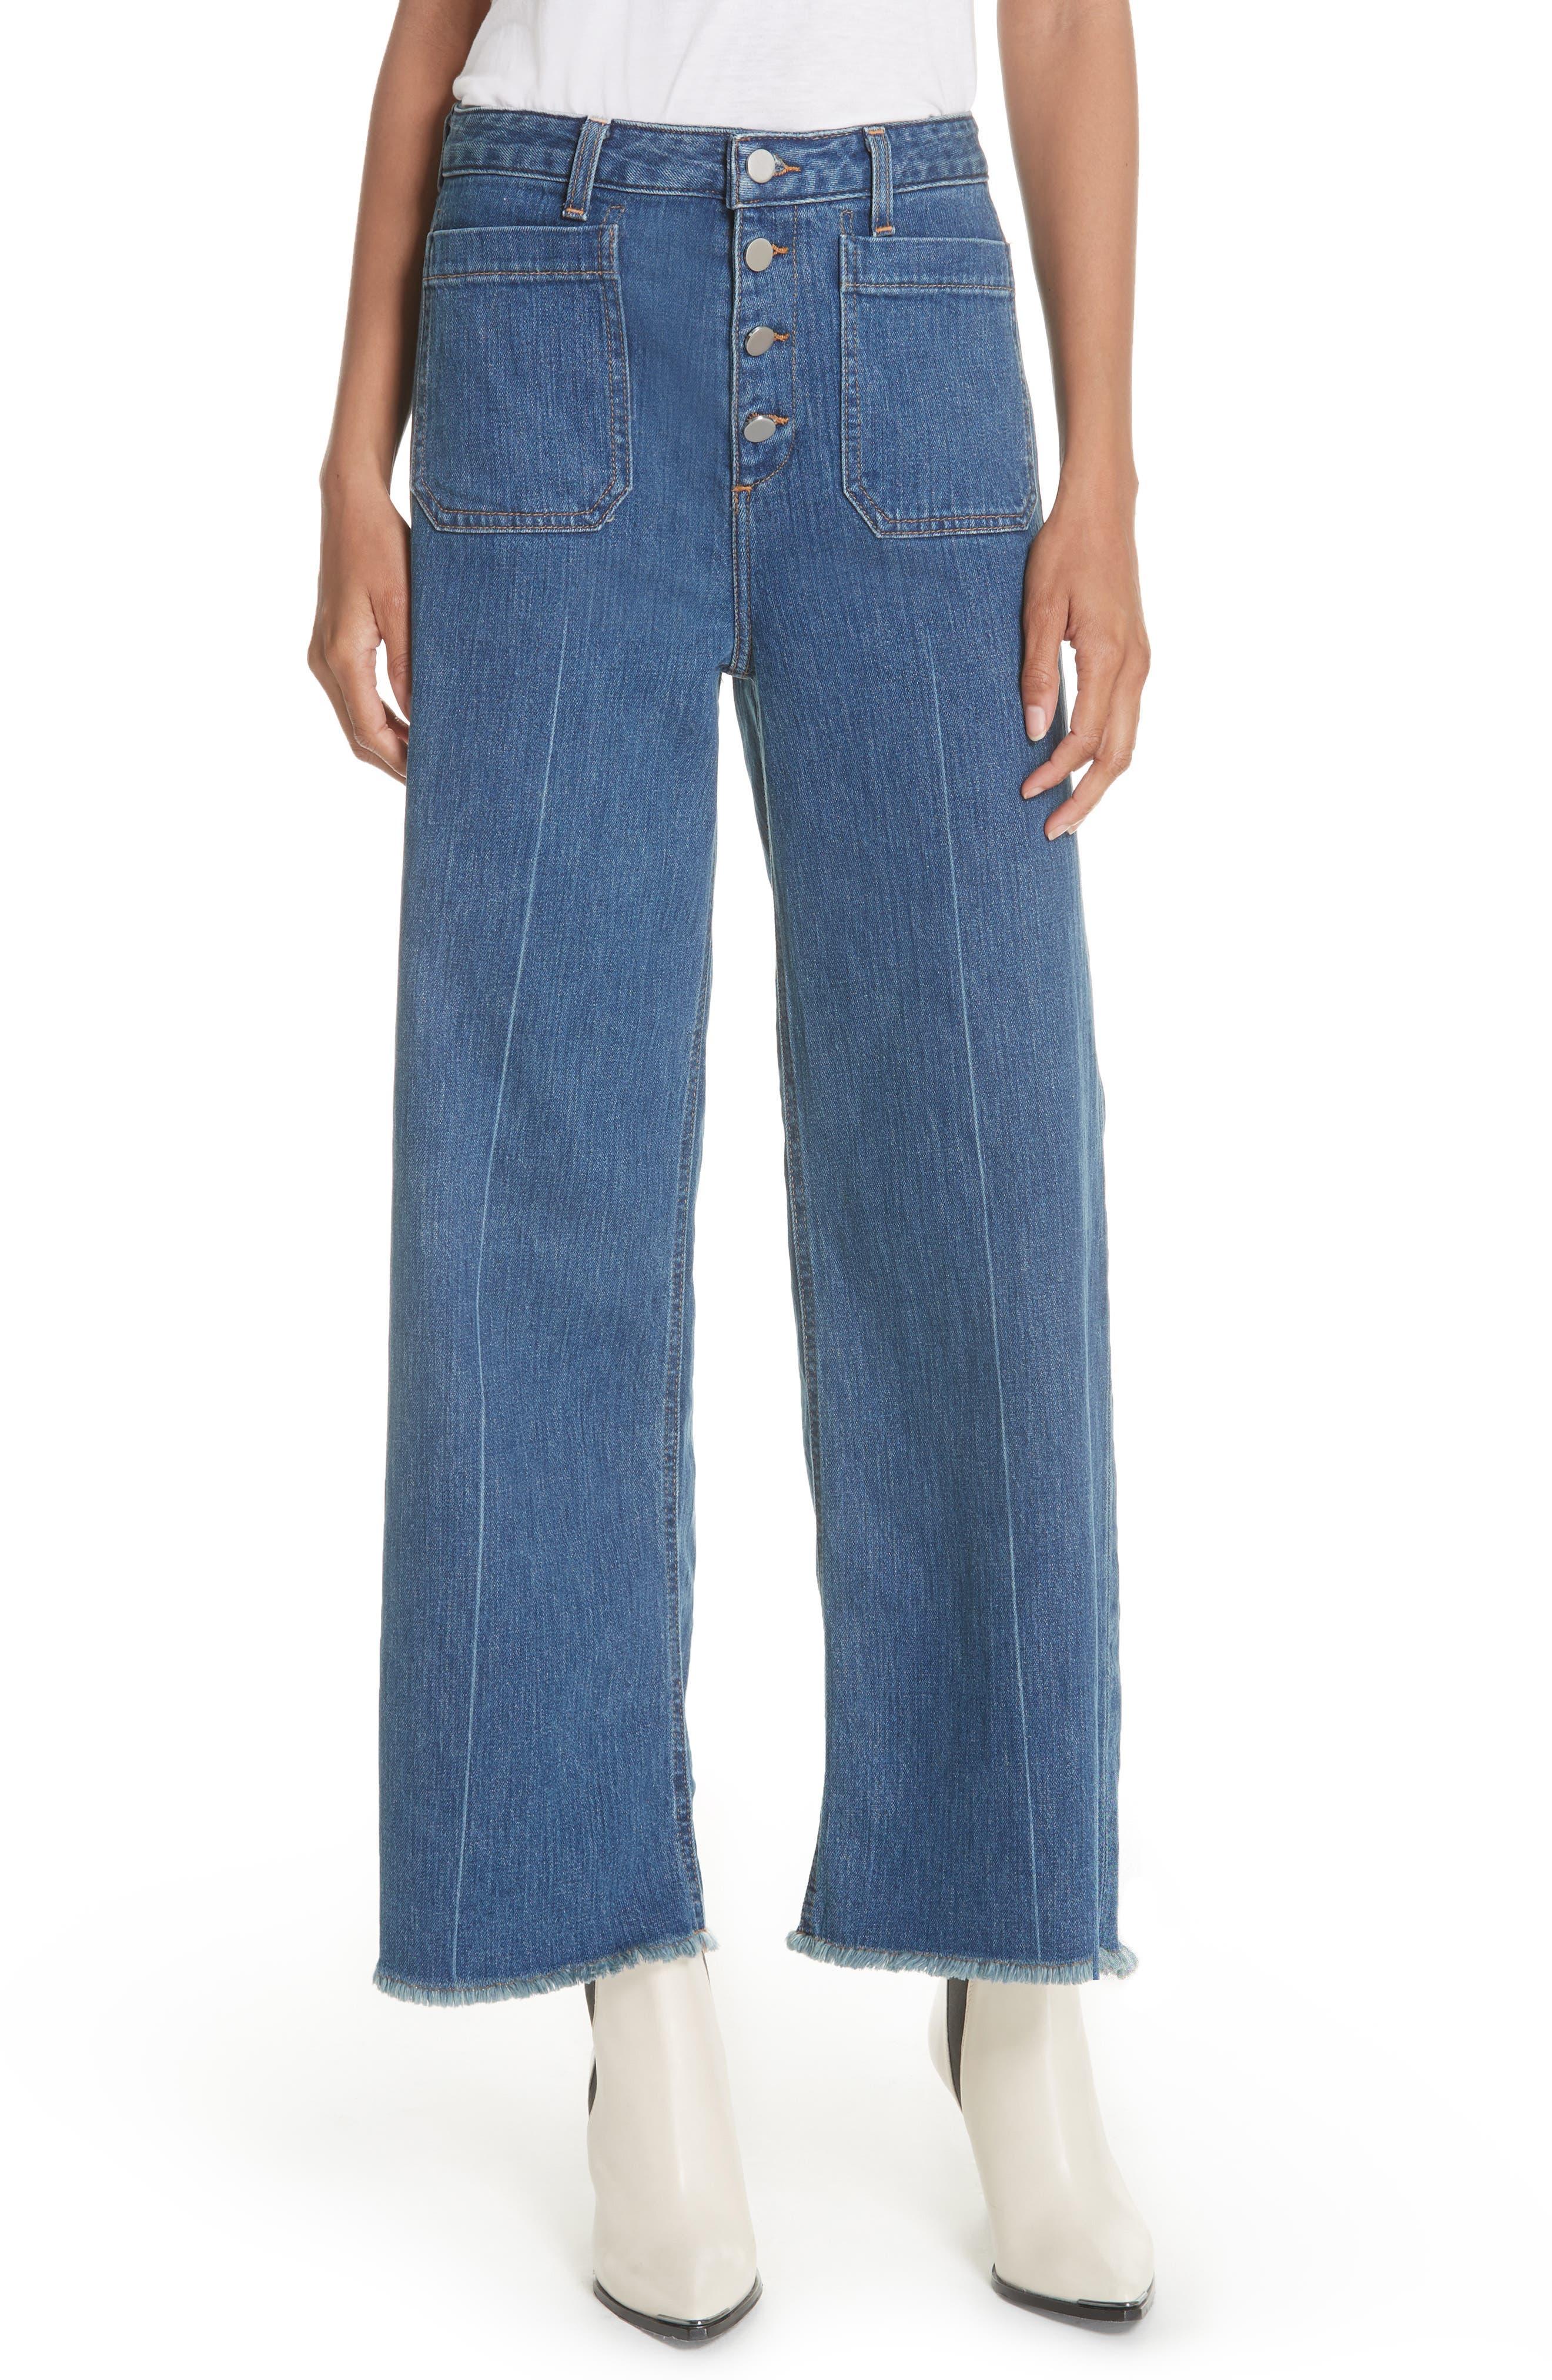 Carmine Wide Leg Jeans,                         Main,                         color, Medium Denim